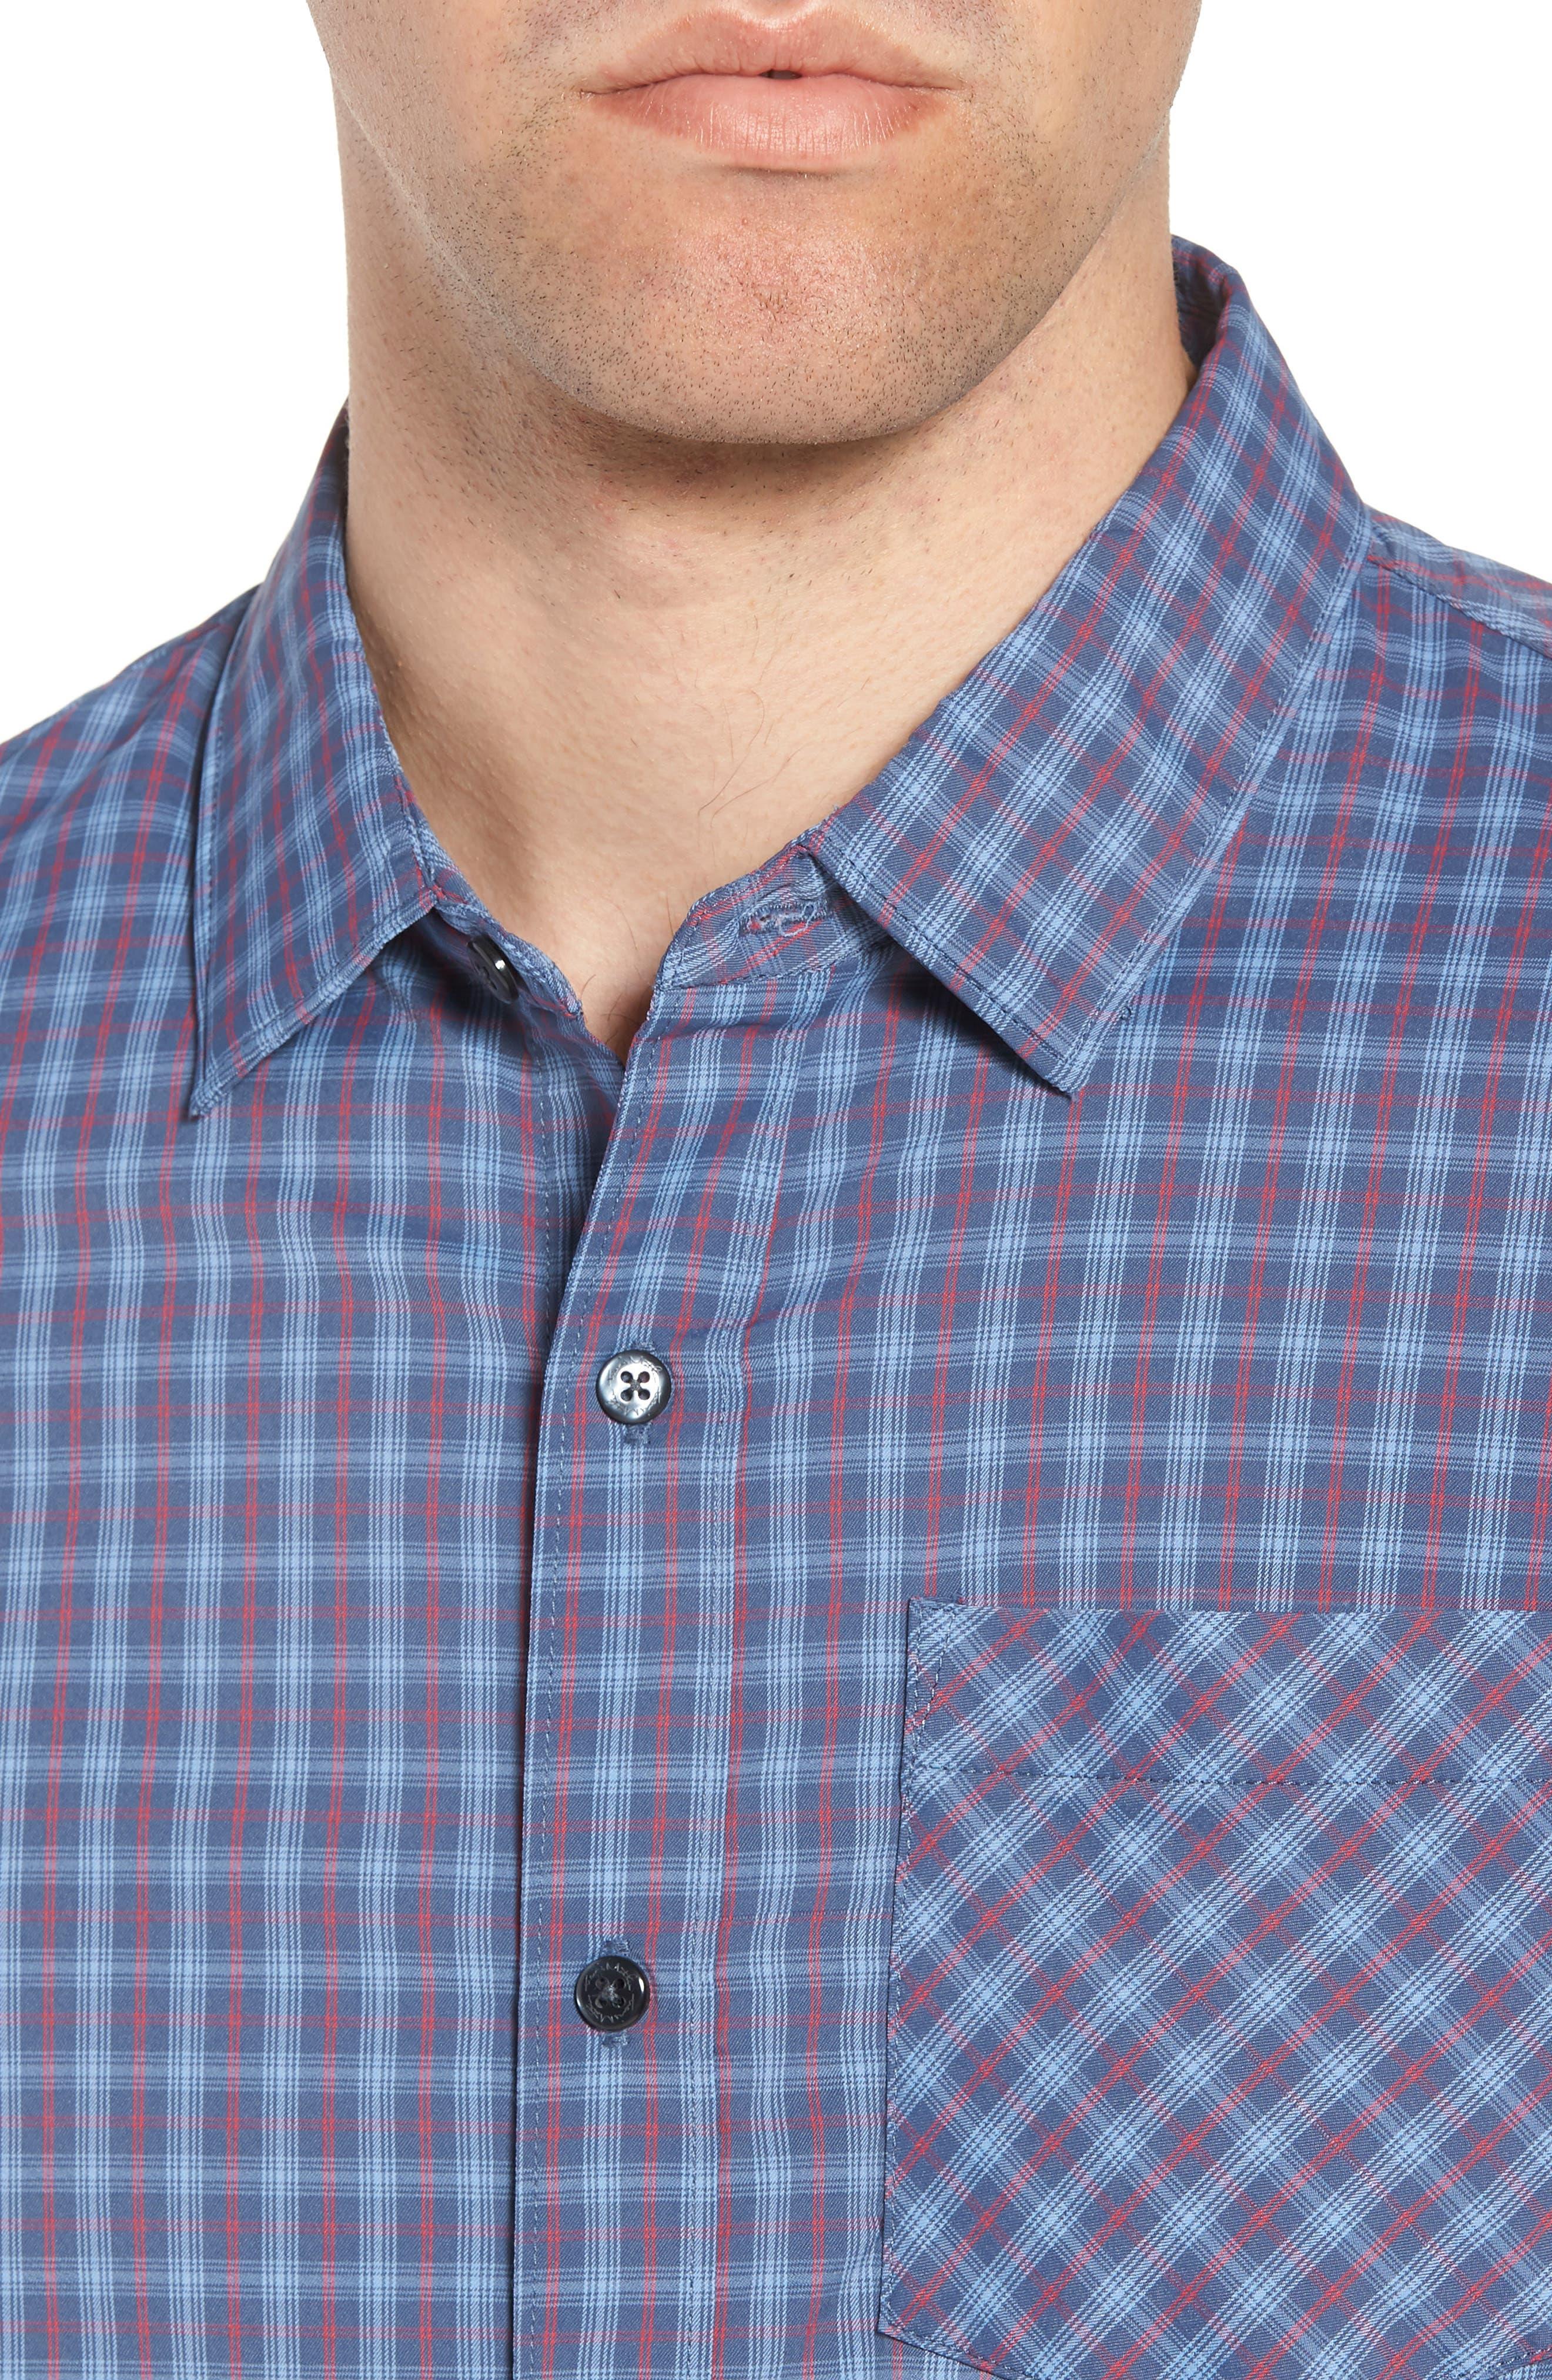 Smoke Bomb Regular Fit Short Sleeve Sport Shirt,                             Alternate thumbnail 4, color,                             400